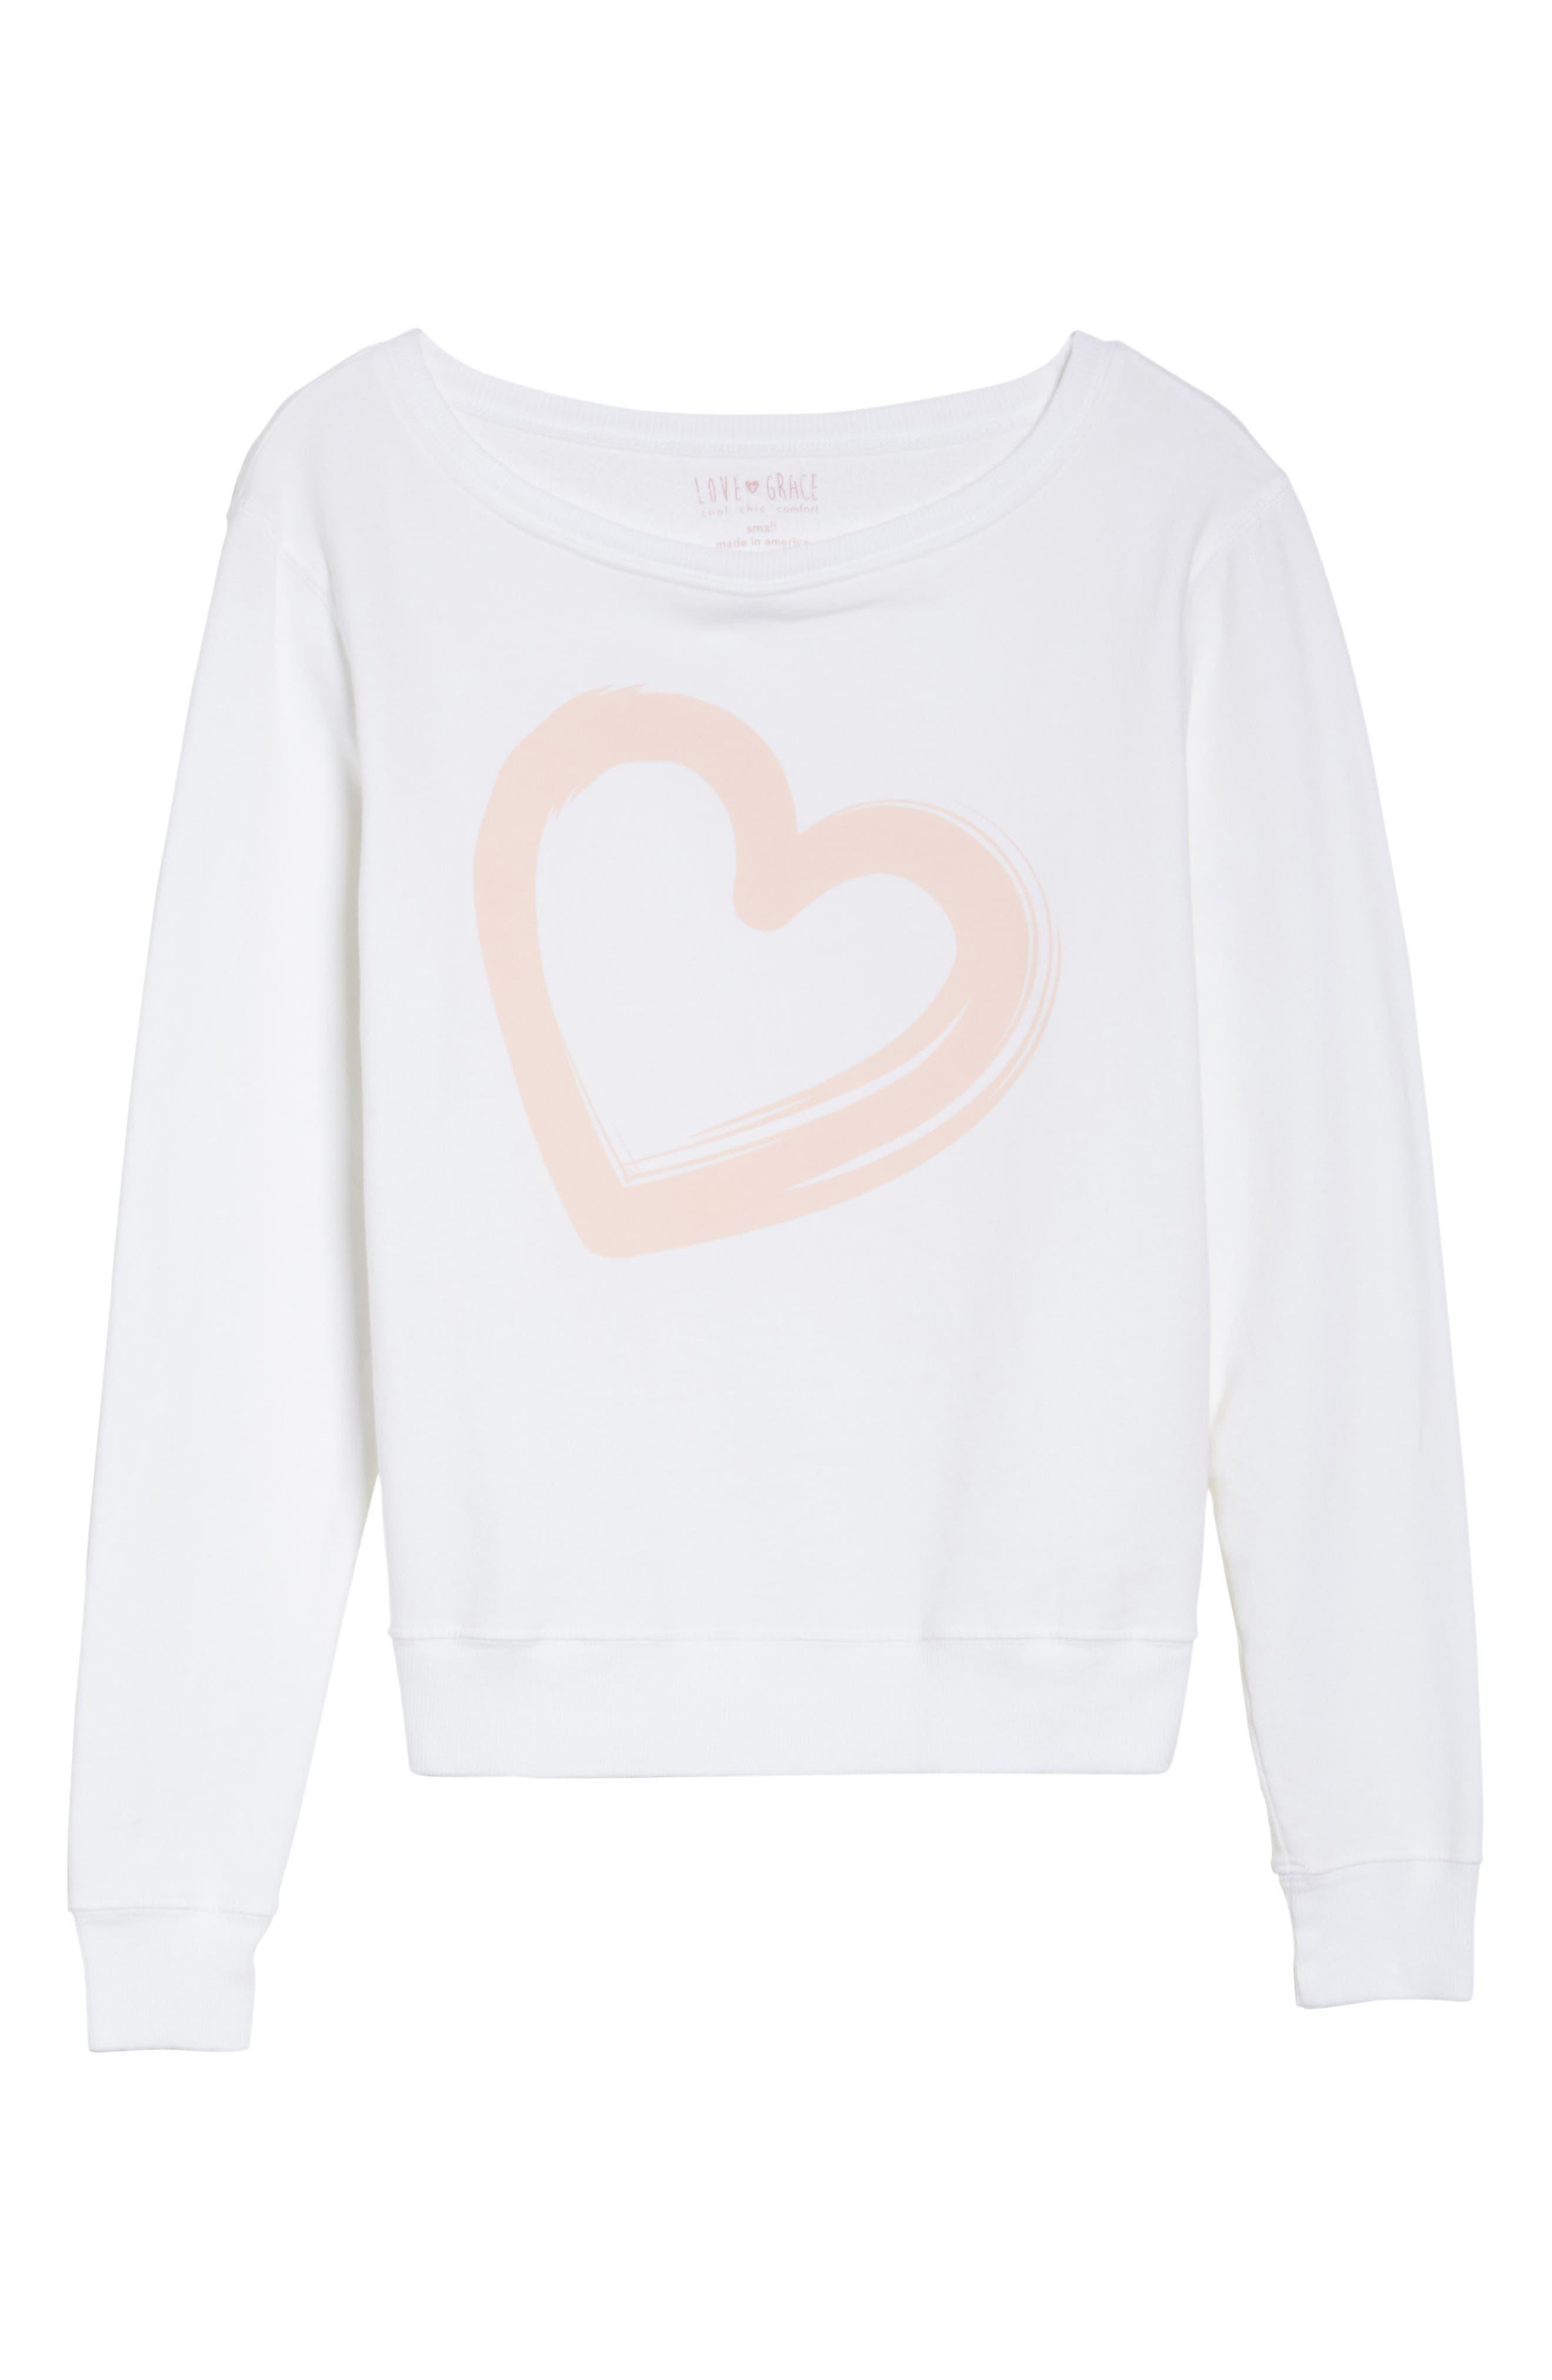 Lordes Fuzzy Fleece Sweatshirt,                             Alternate thumbnail 6, color,                             100